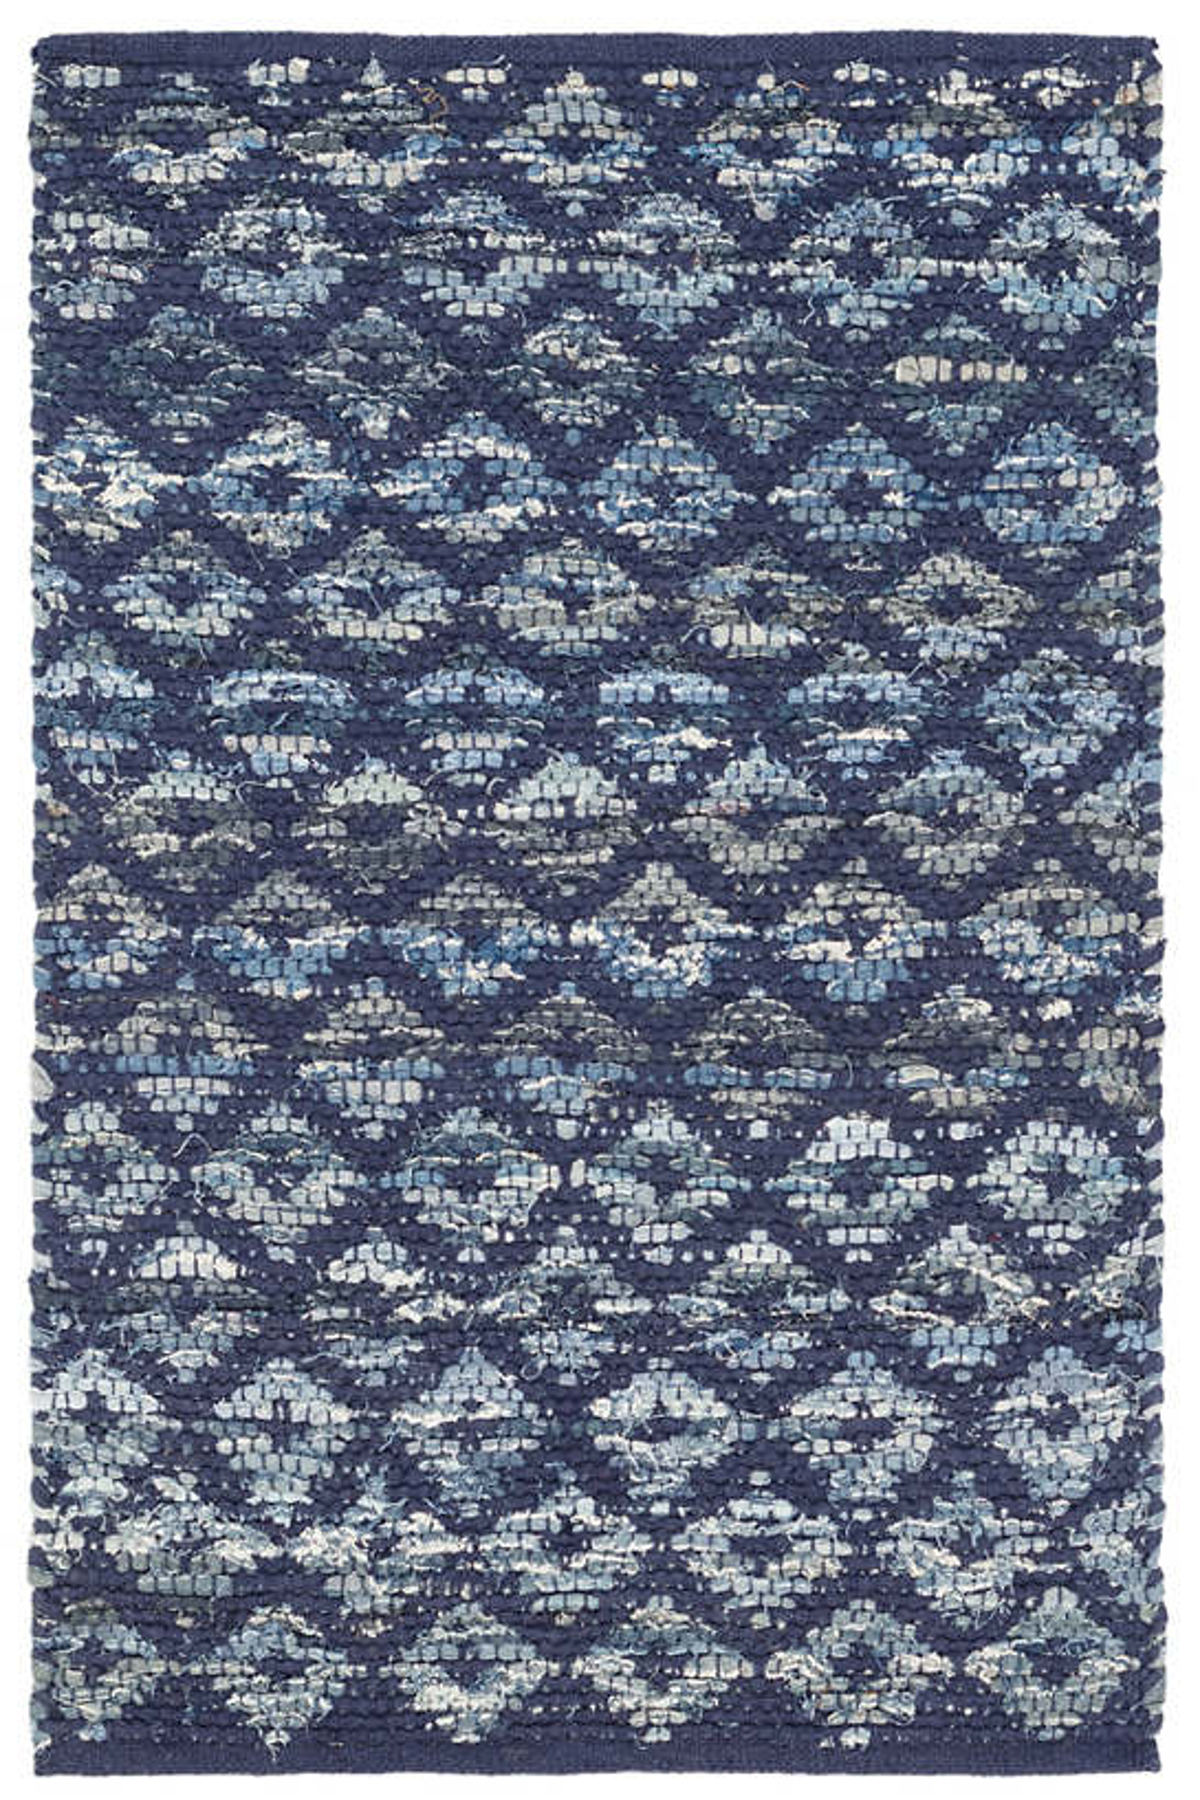 Denim Rag Diamond Indigo Woven Cotton Rug